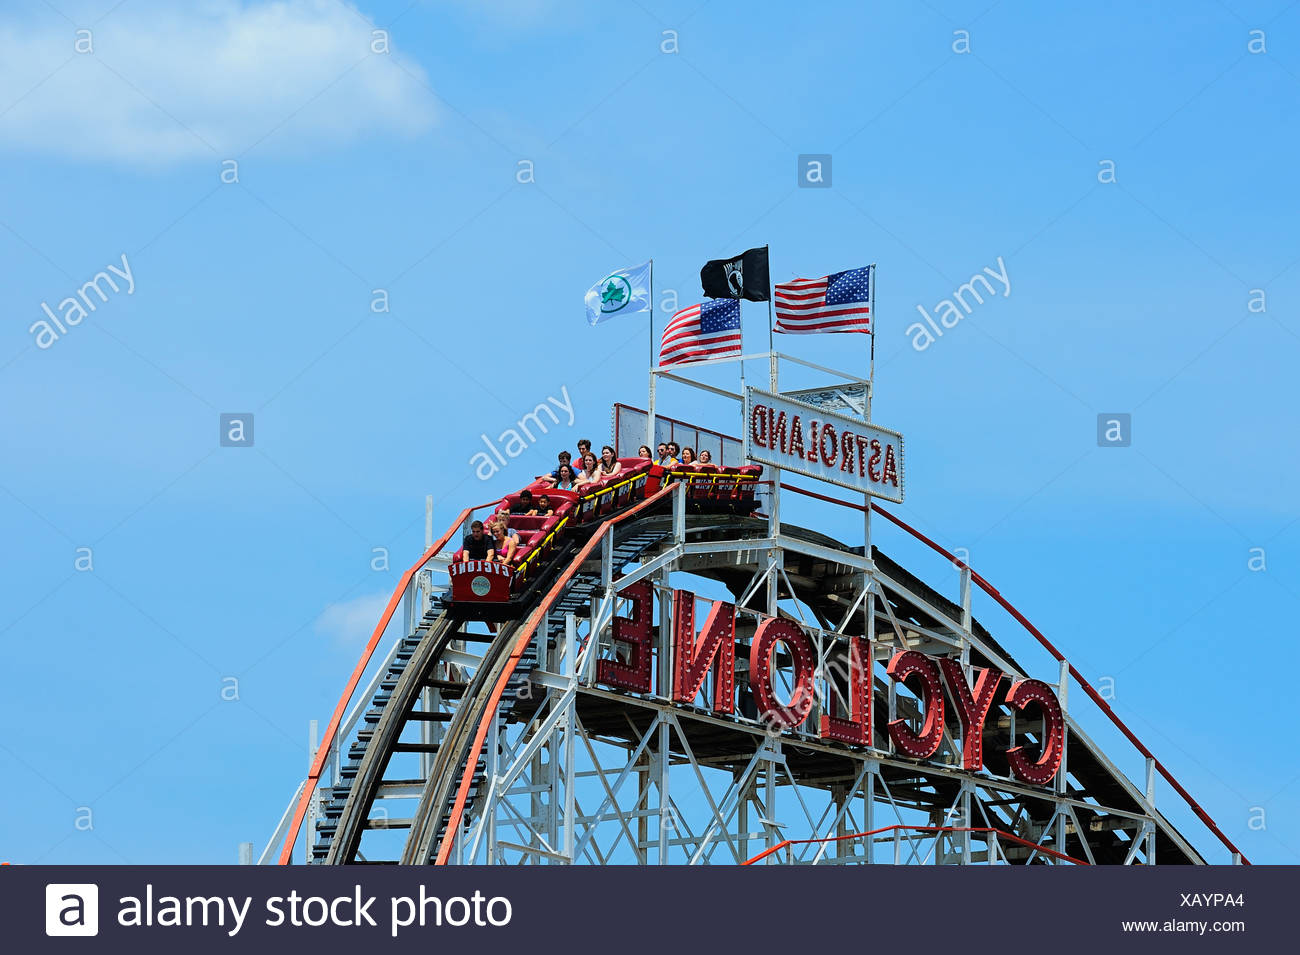 Coney Island Cyclone, rollercoaster, Astroland Park, Coney Island, New York, USA - Stock Image